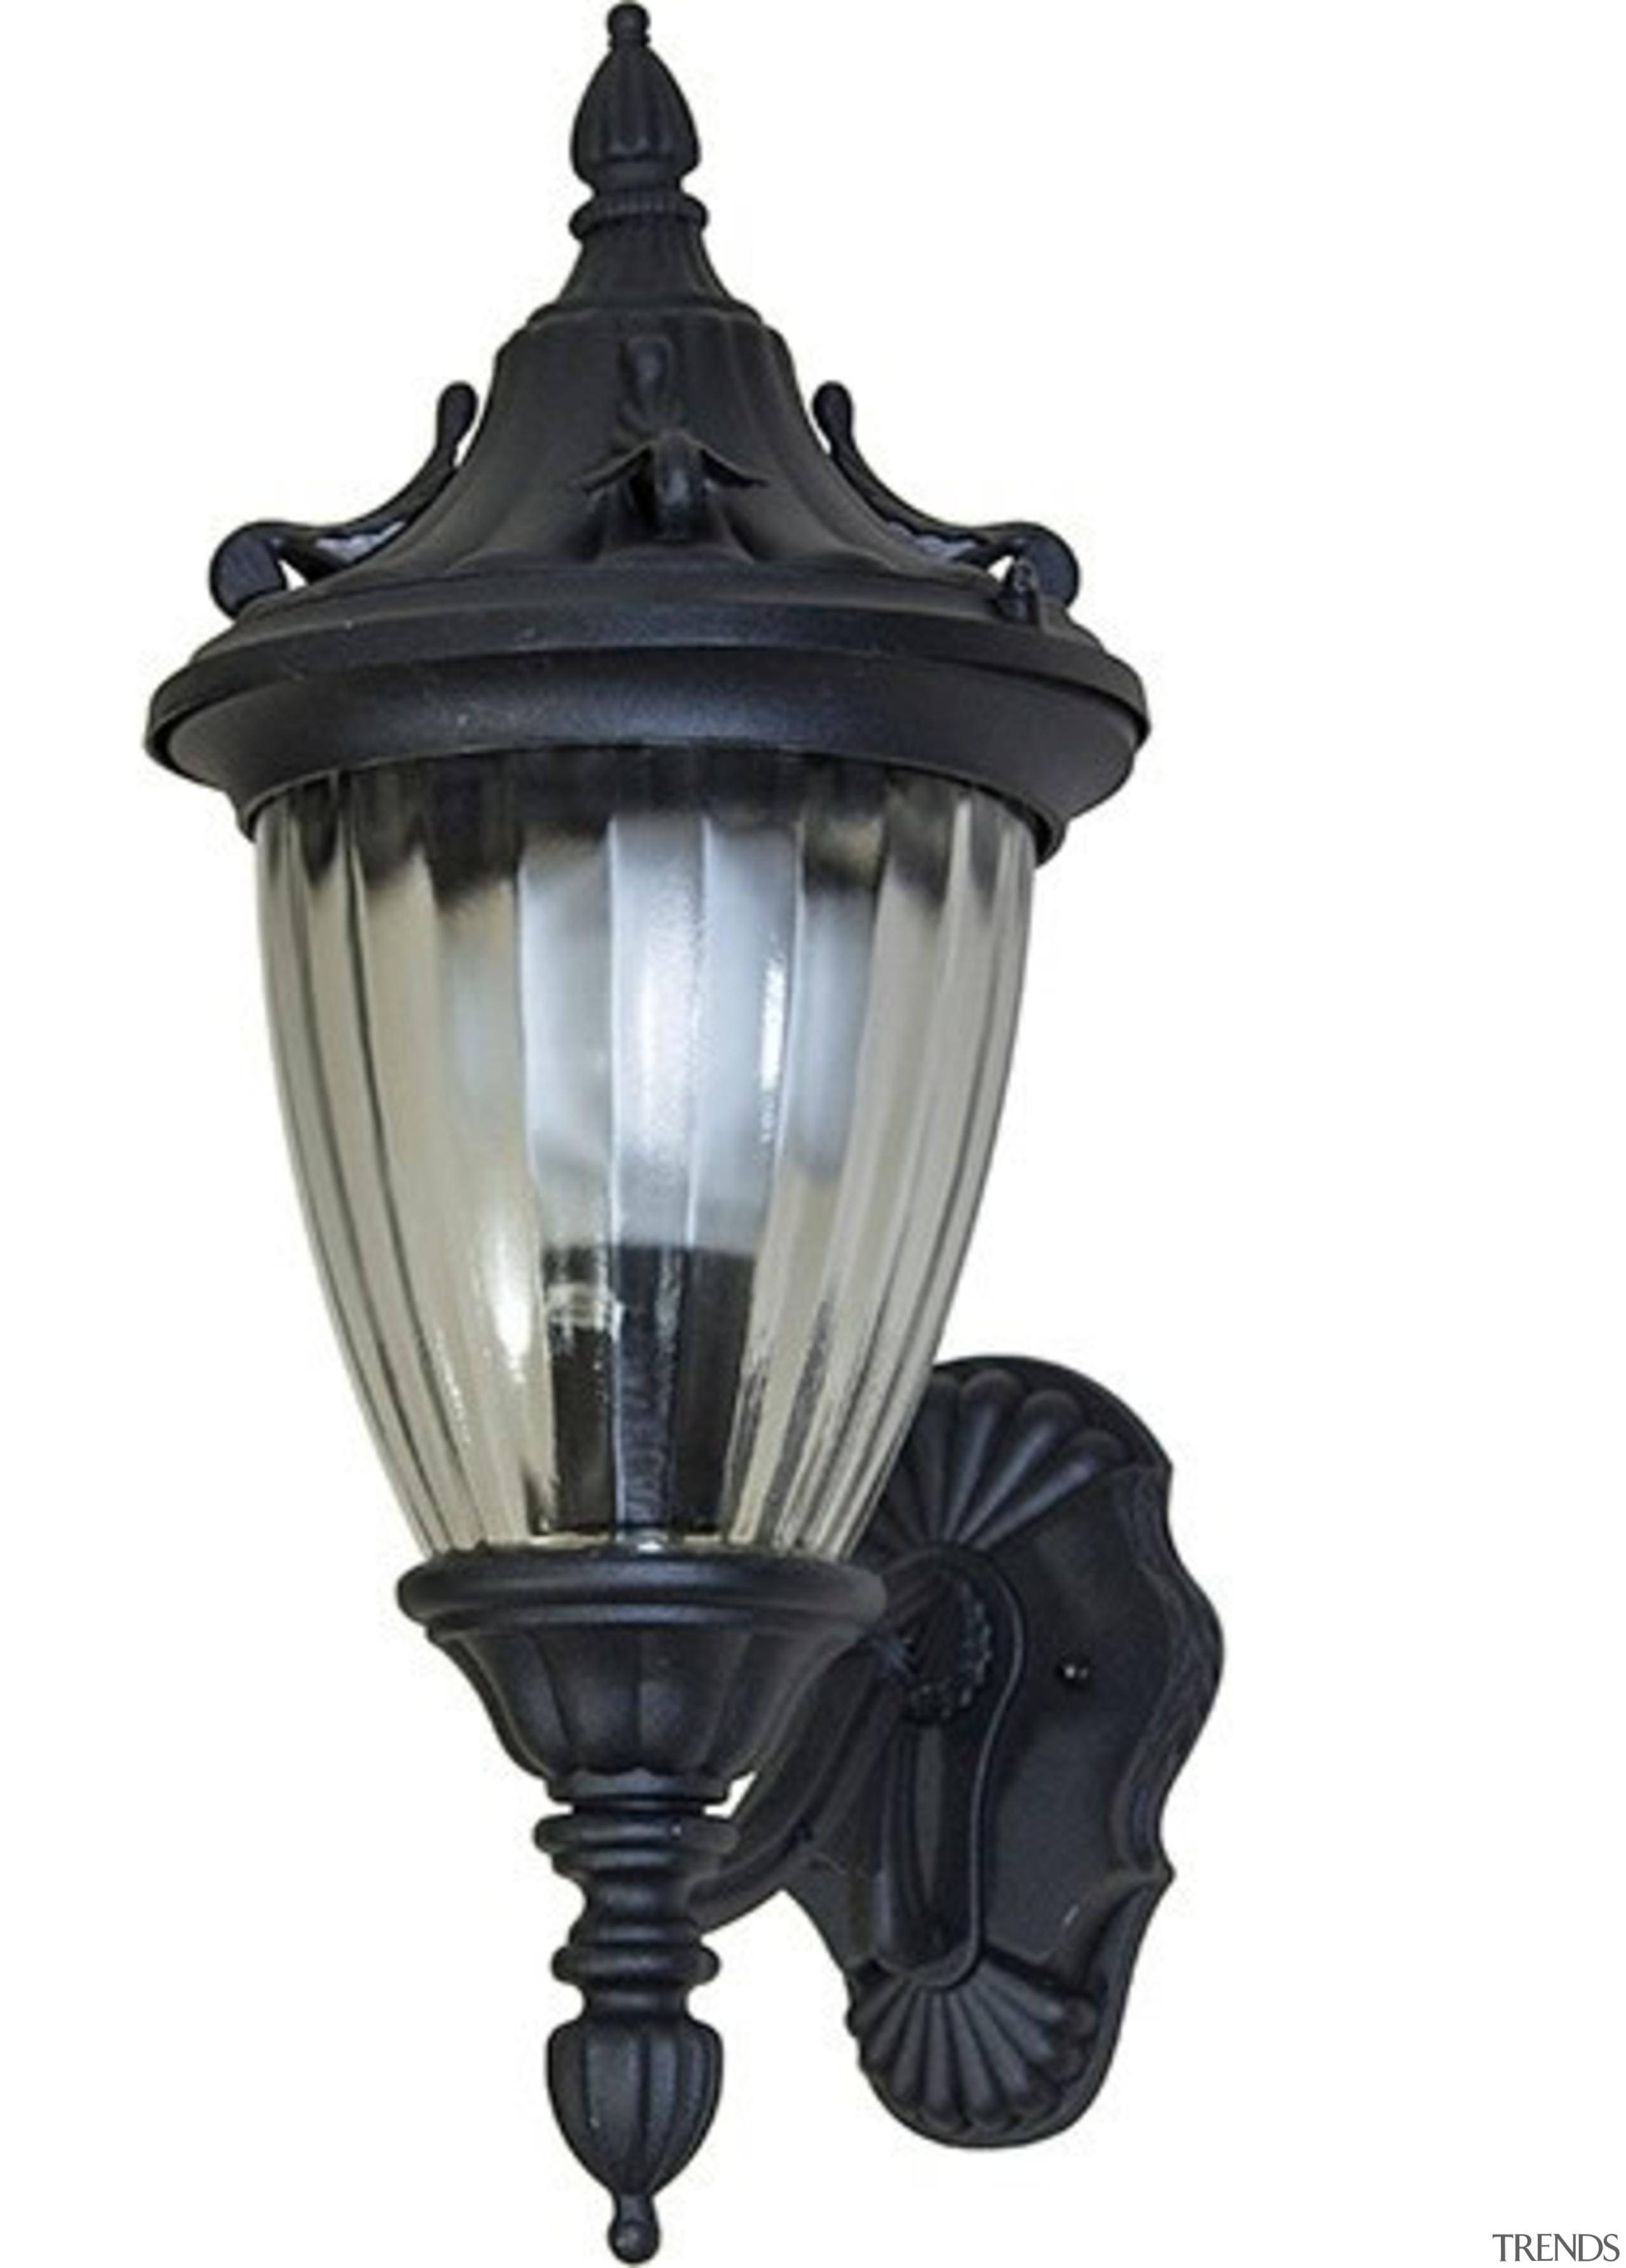 FeaturesA classic larger style exterior lantern.  Powder ceiling fixture, light fixture, lighting, white